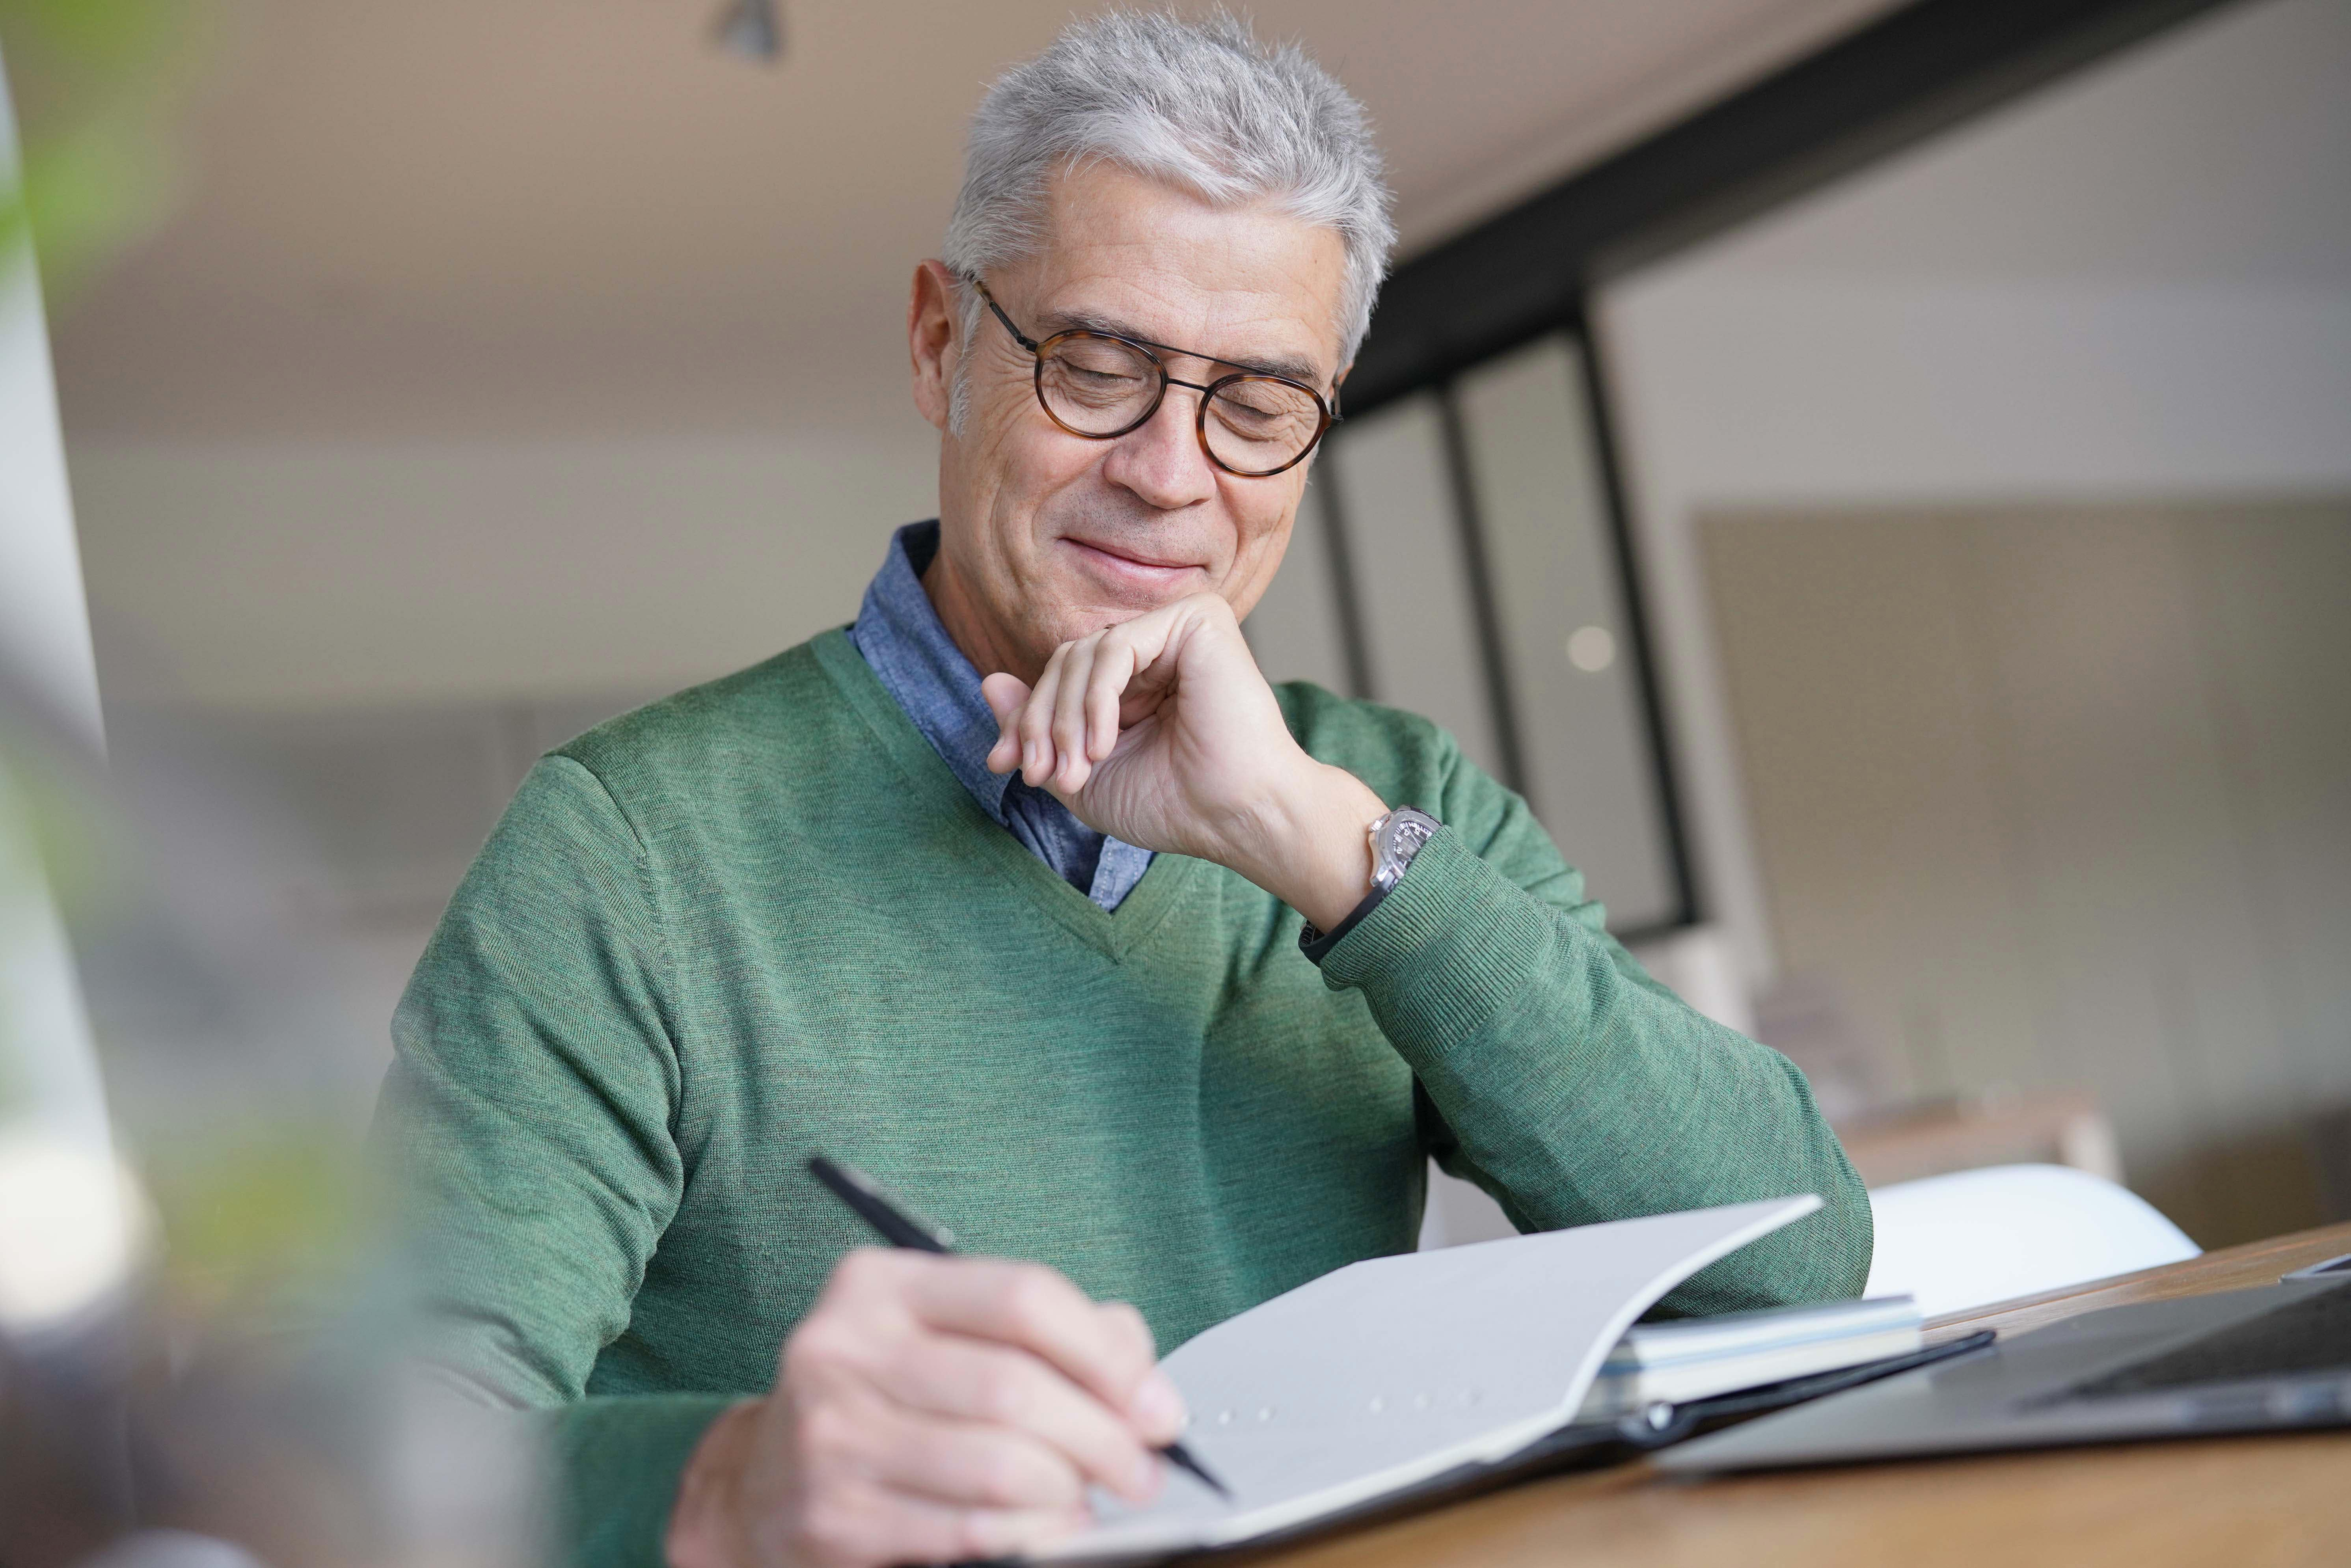 Five Reasons Seniors Should Start Journaling